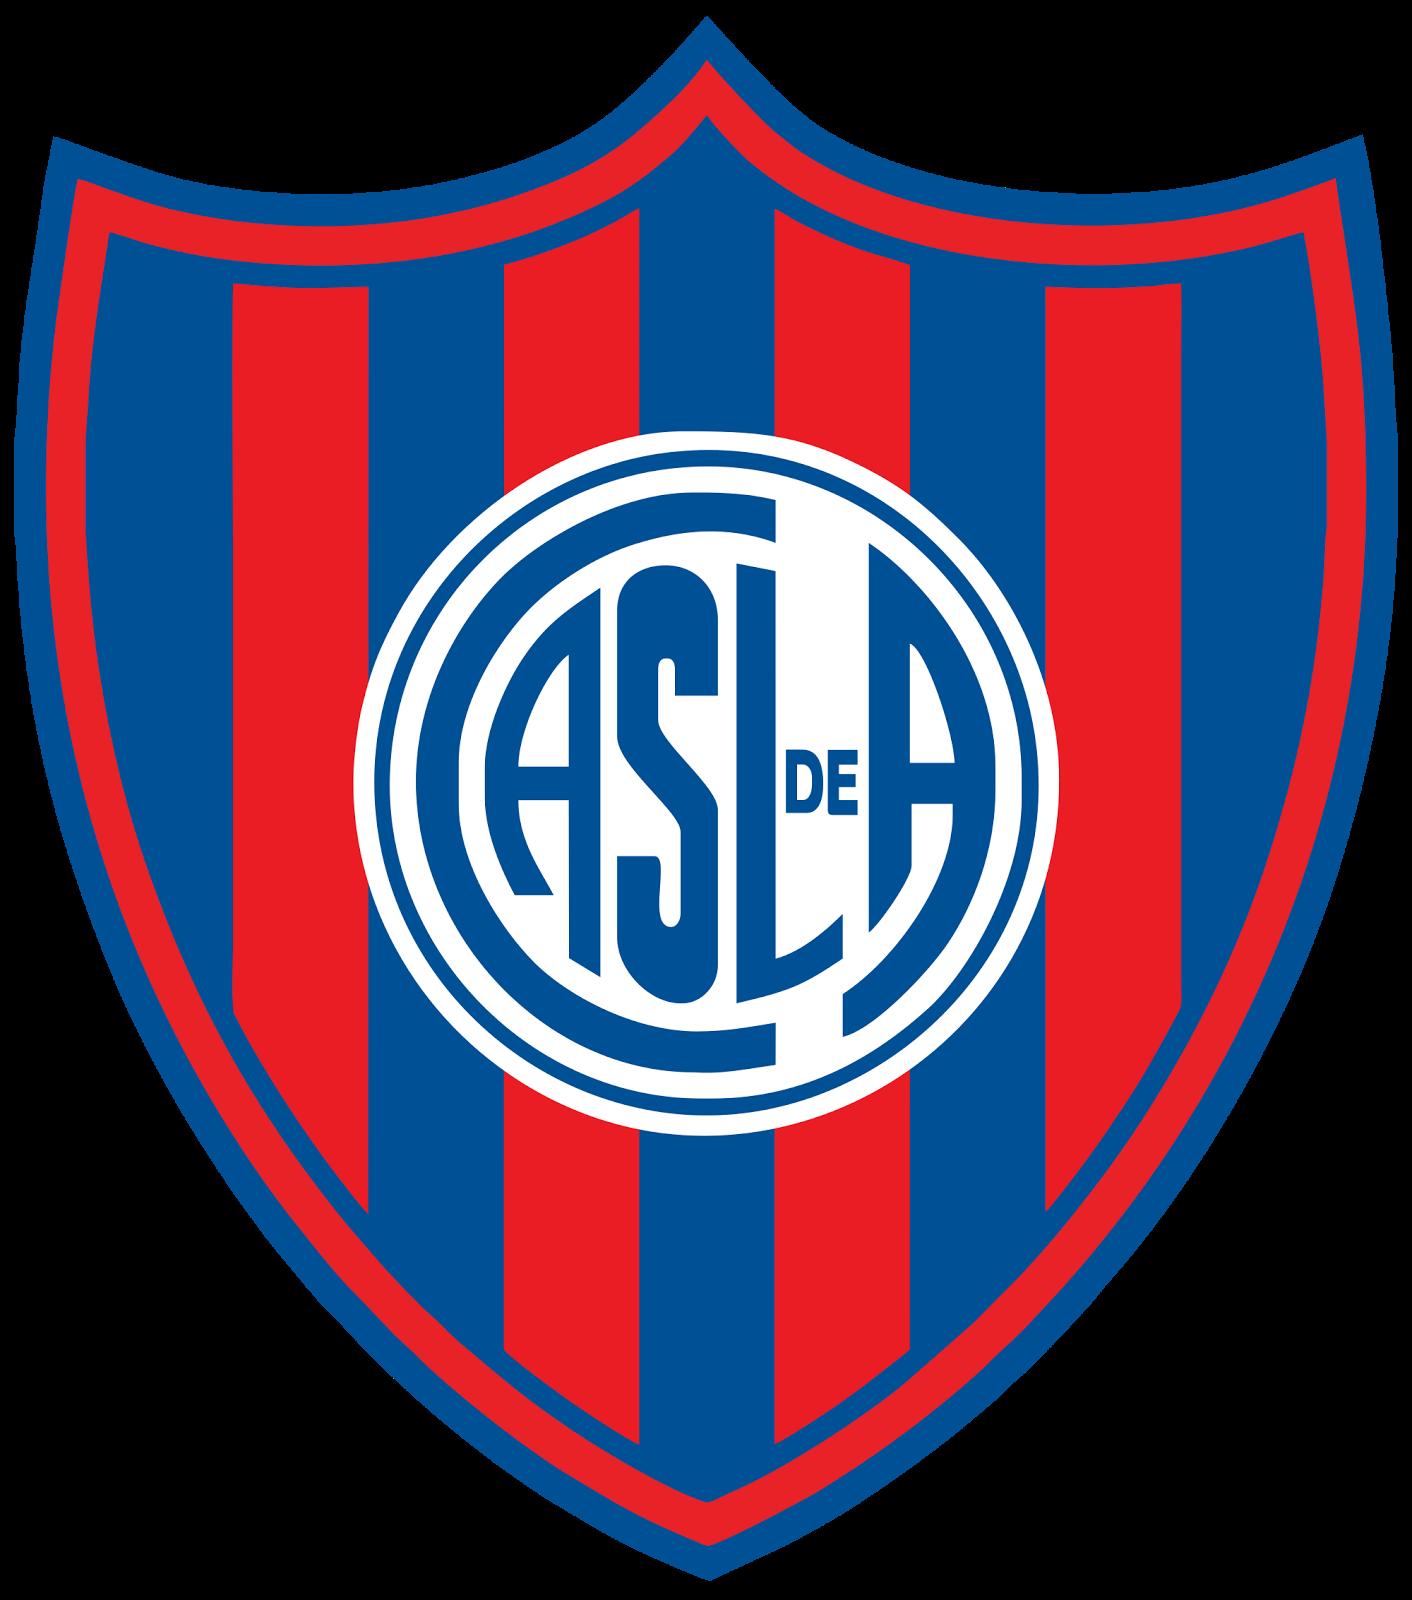 Liga profesional argentina match preview for independiente v godoy cruz on september 26, 2021, includes latest club news, team head to head form,. Escudos de Clubes de Futebol: Escudos de Clubes da Argentina